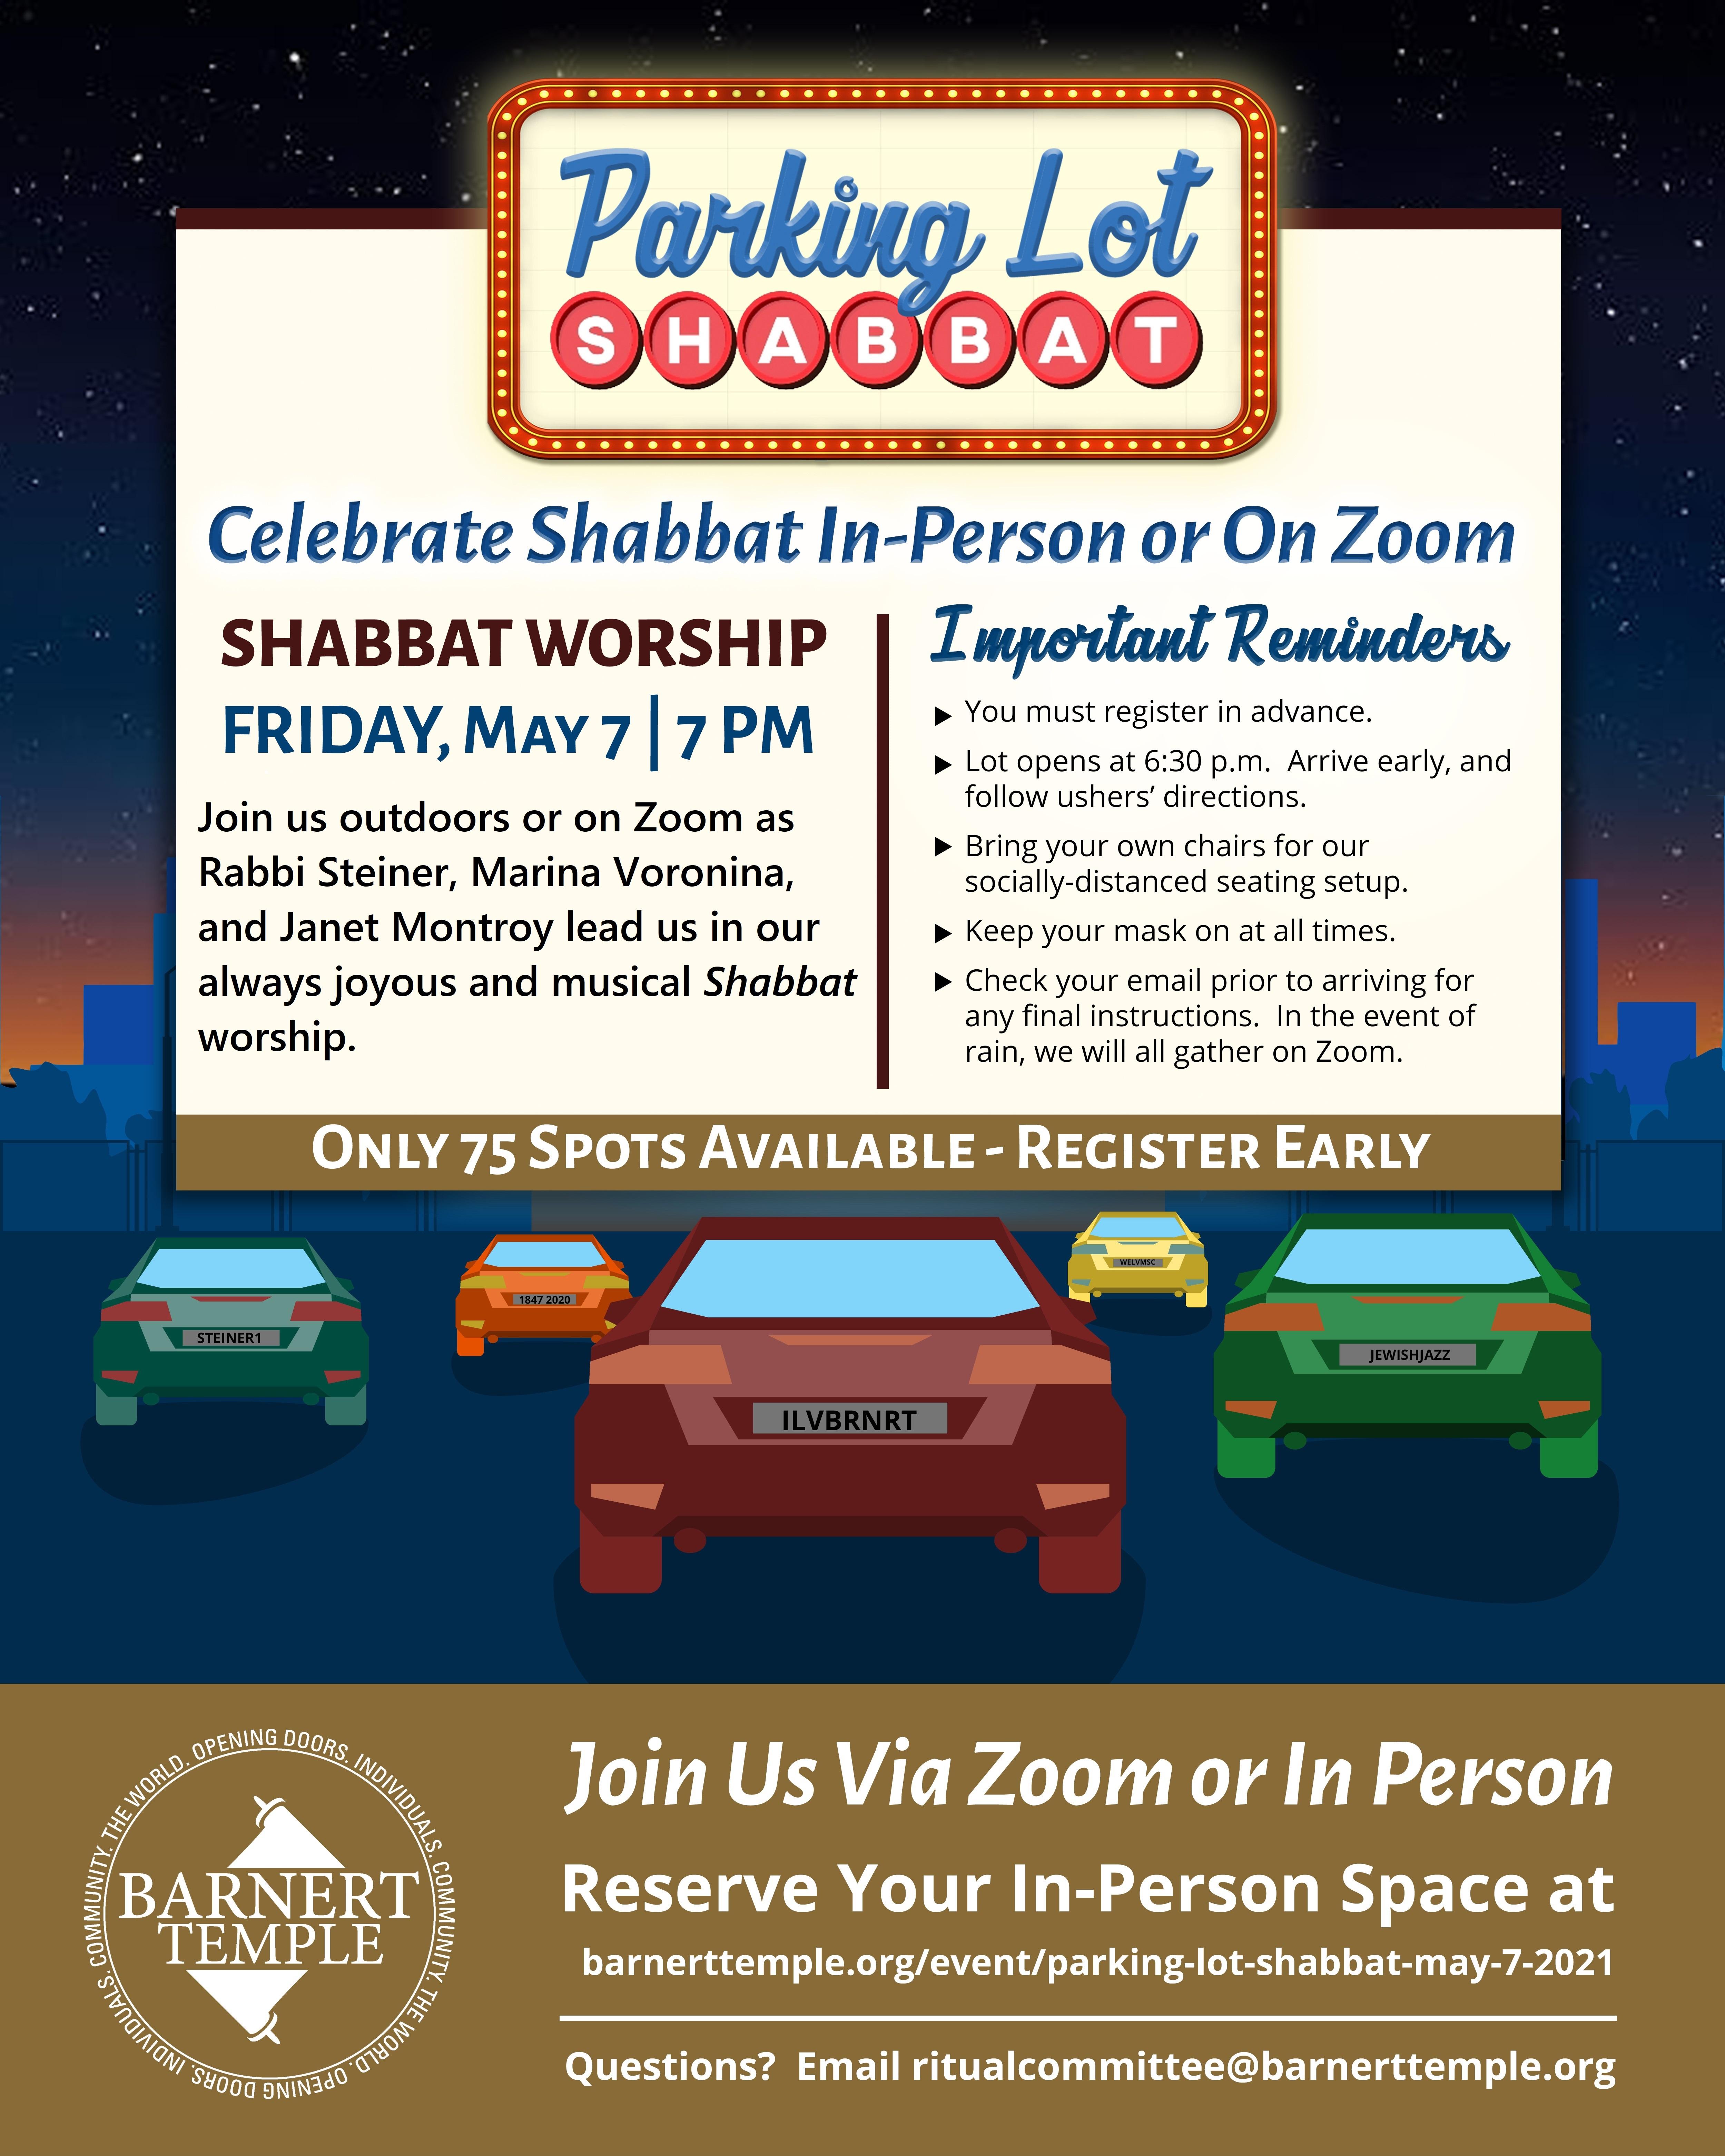 Parking Lot Shabbat May 7 Ad